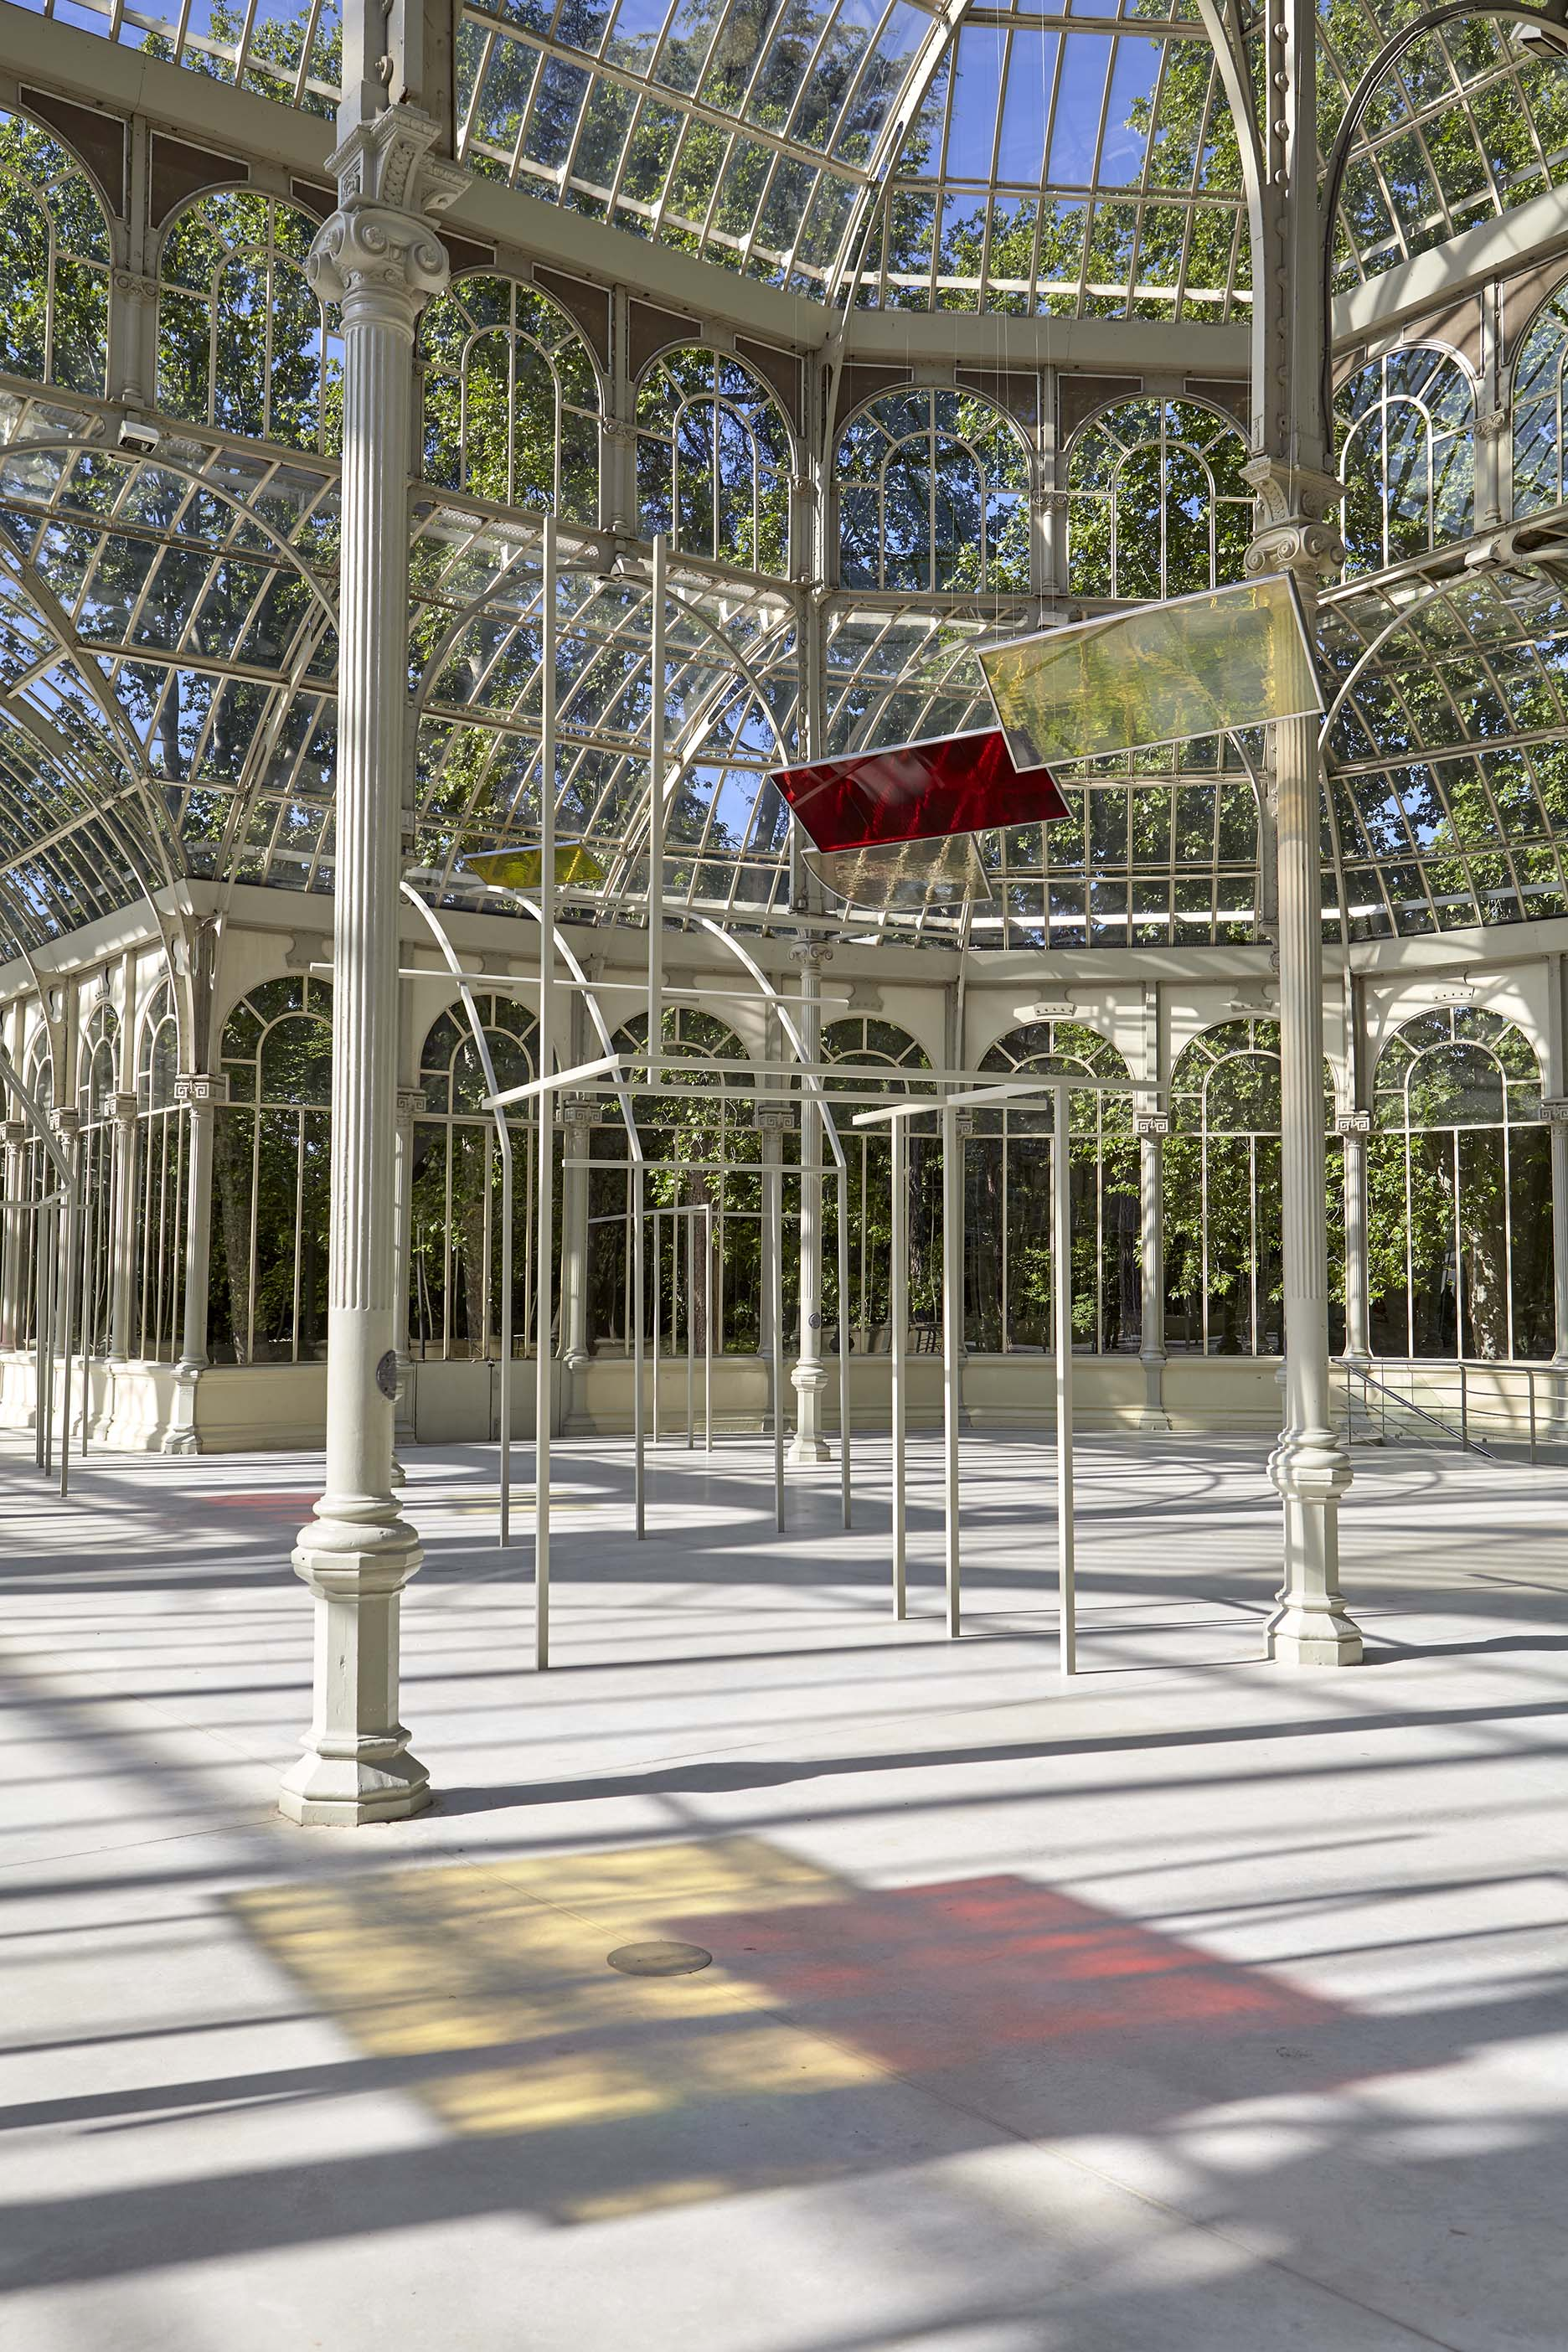 Rosa Barba,  Solar Flux Recordings , 2017; metal, color glass filters, and engraved plates. Installation view, Palacio de Cristal, Museo Nacional Centro de Arte Reina Sofía, Madrid. Photo: Joaquín Cortés / Román Lores © Rosa Barba